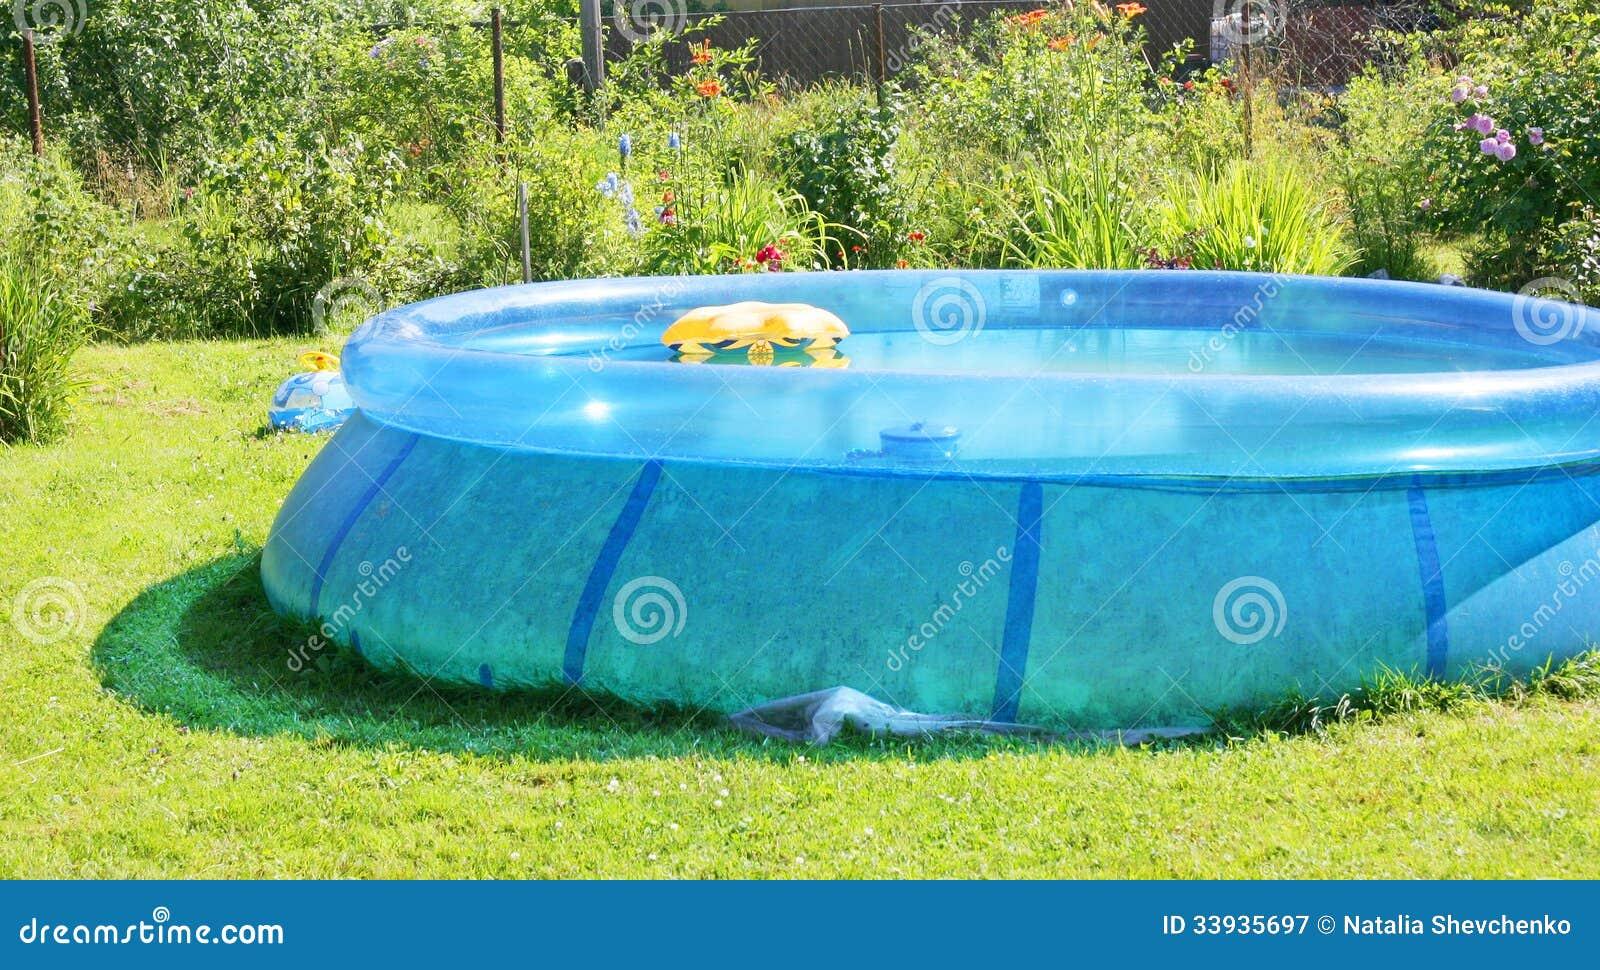 Aufblasbarer Swimmingpool stockbild. Bild von draußen - 33935697